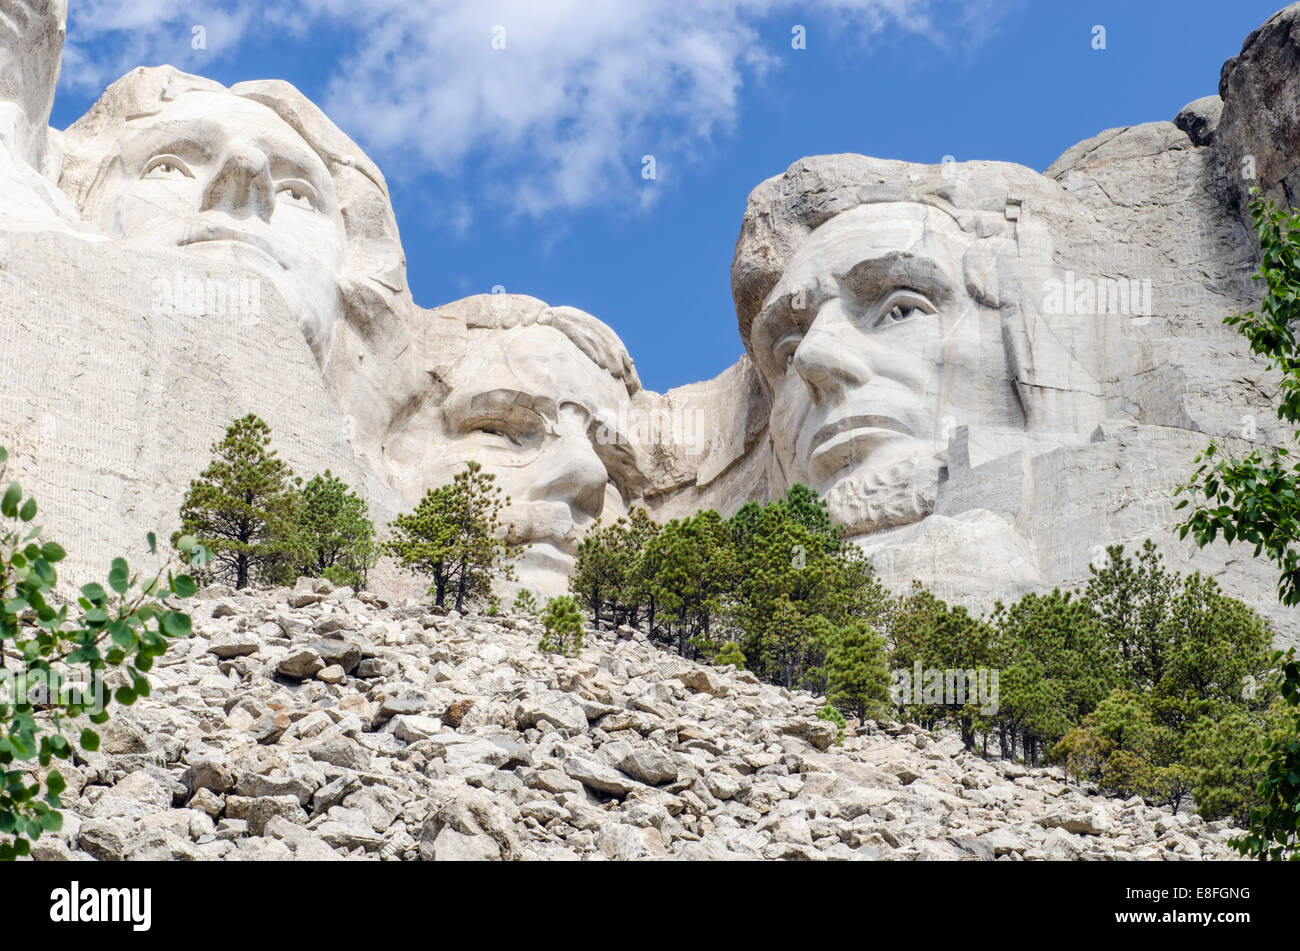 USA, South Dakota, Mount Rushmore, View of Mt Rushmore National Monument - Stock Image